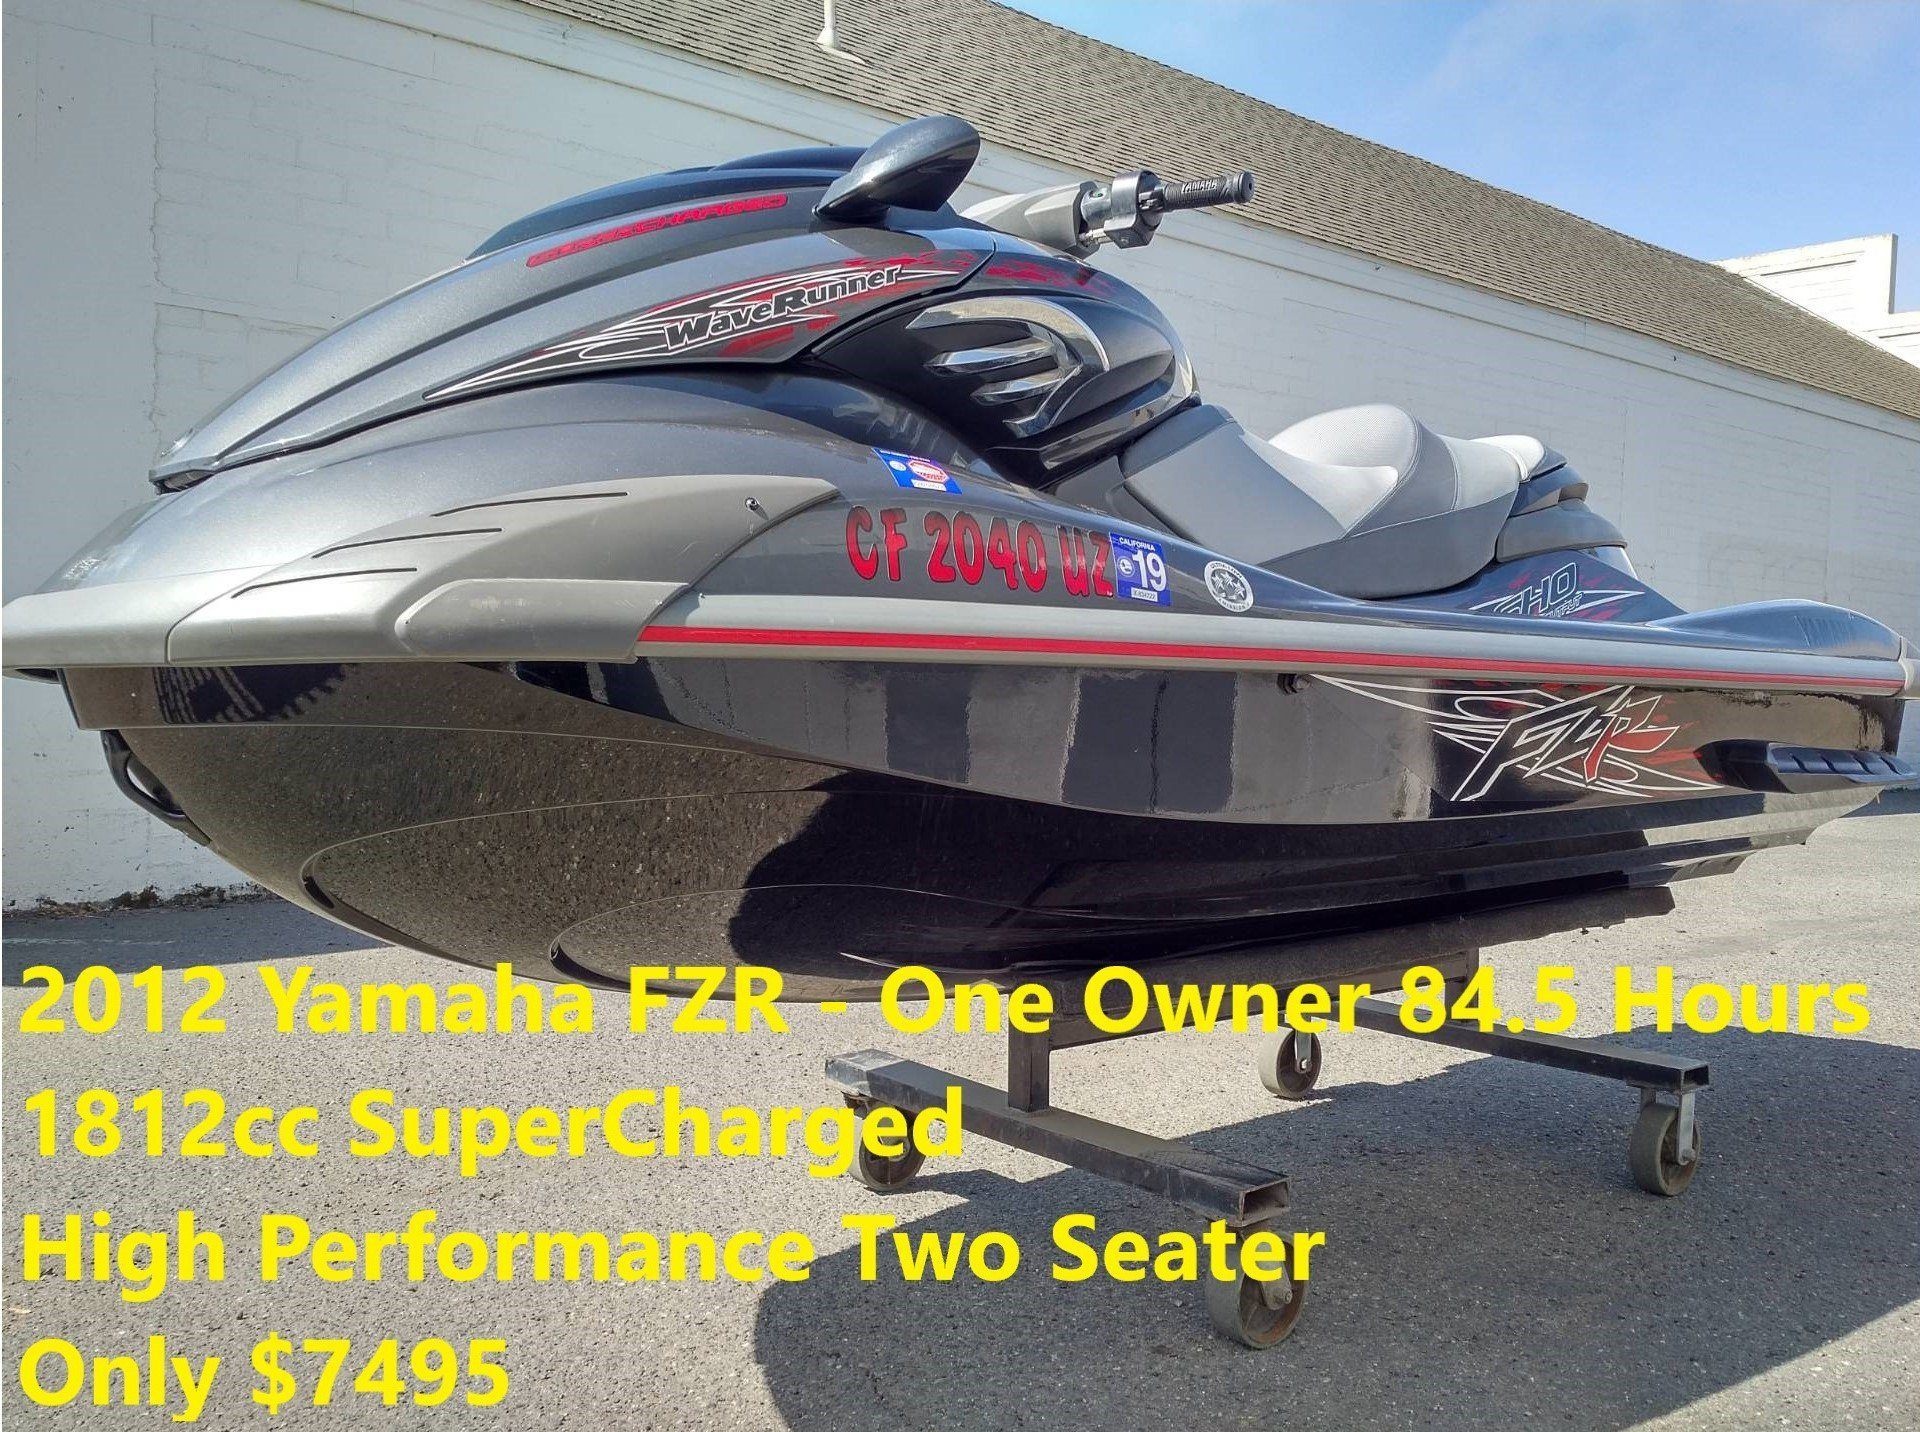 Salinas Motorcycle Center New Used Motorsports Vehicles For Sale Yamaha Golf Cart Engine Diagram Oem Promotions